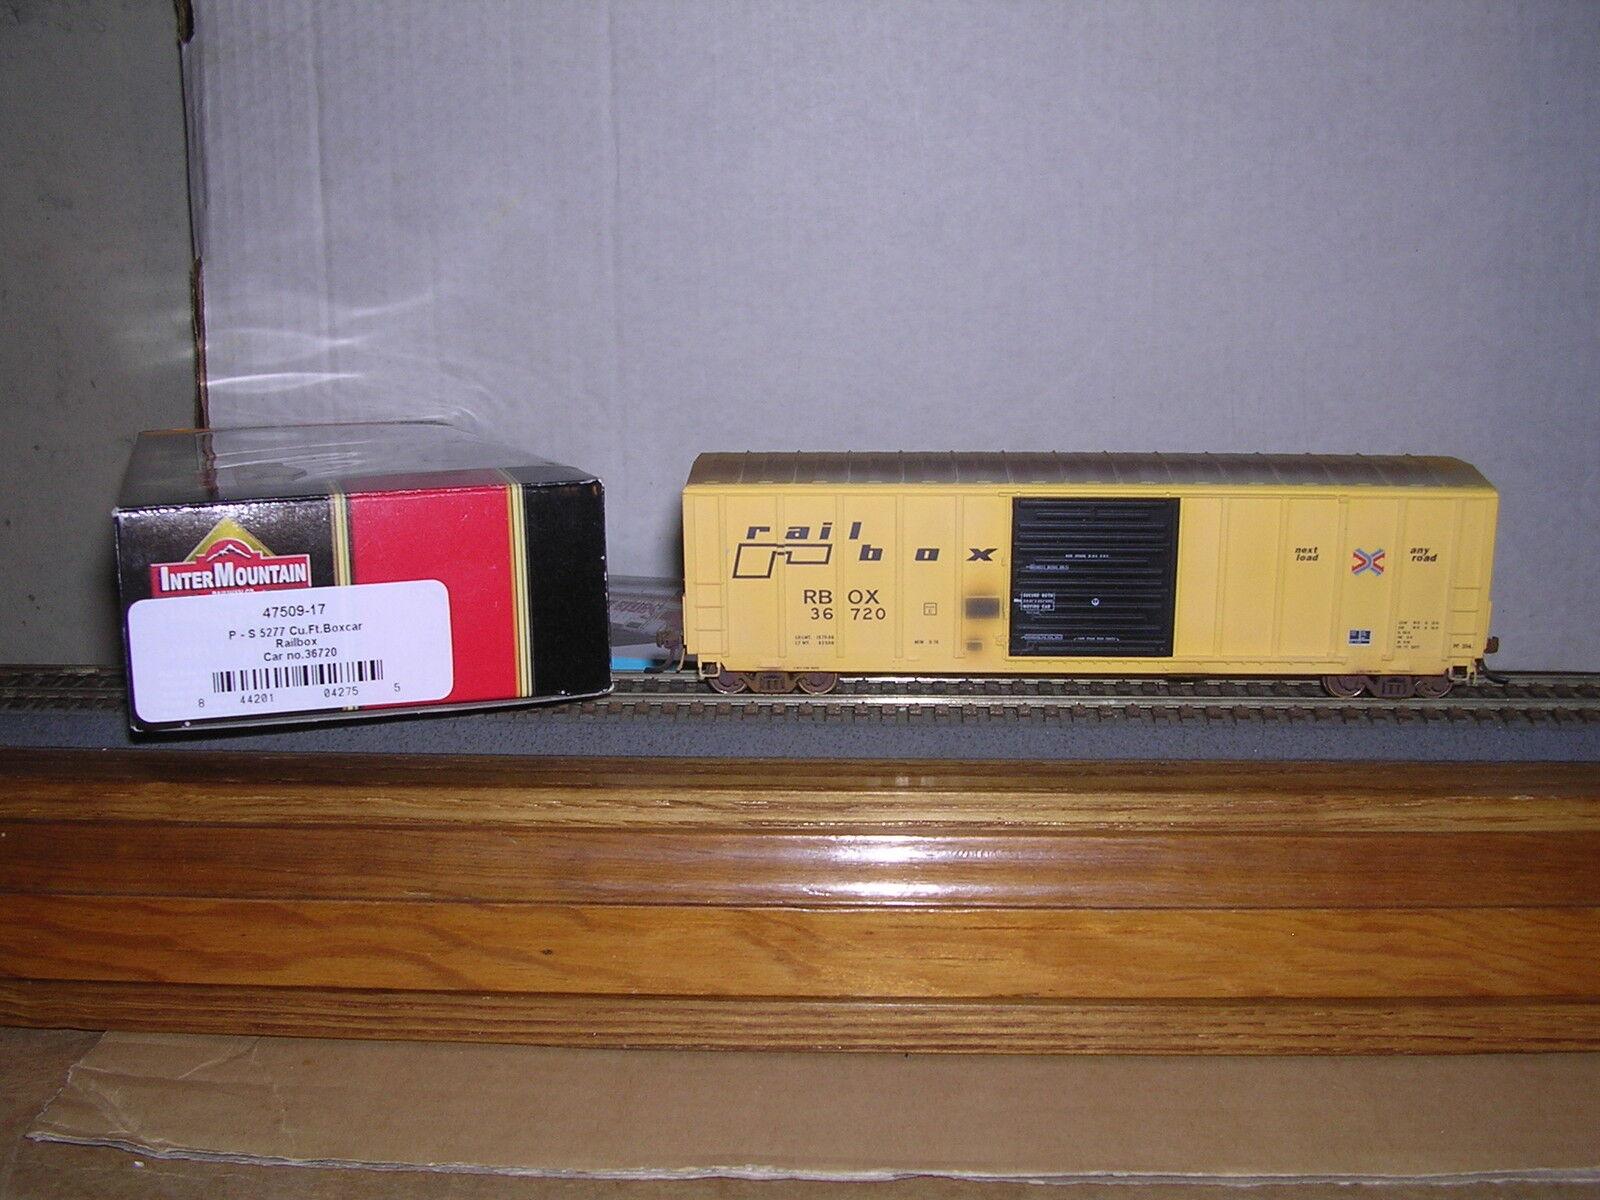 INTER. 47509 Railbox  giallo  P.S.5277 Cu.Ft.Ext.Post Box Car  36720 Weath. 1/87